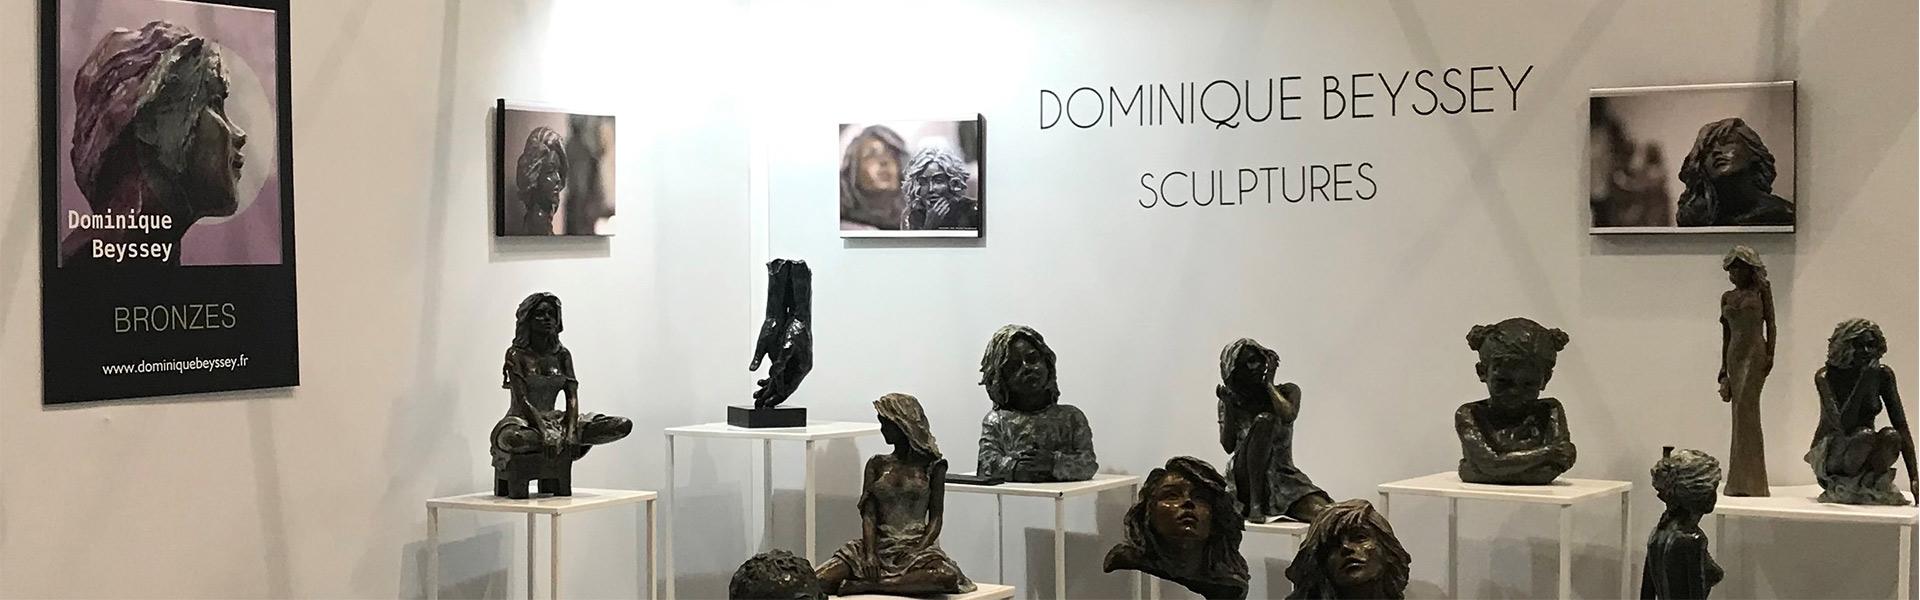 dominique_beyssey_slide1-4